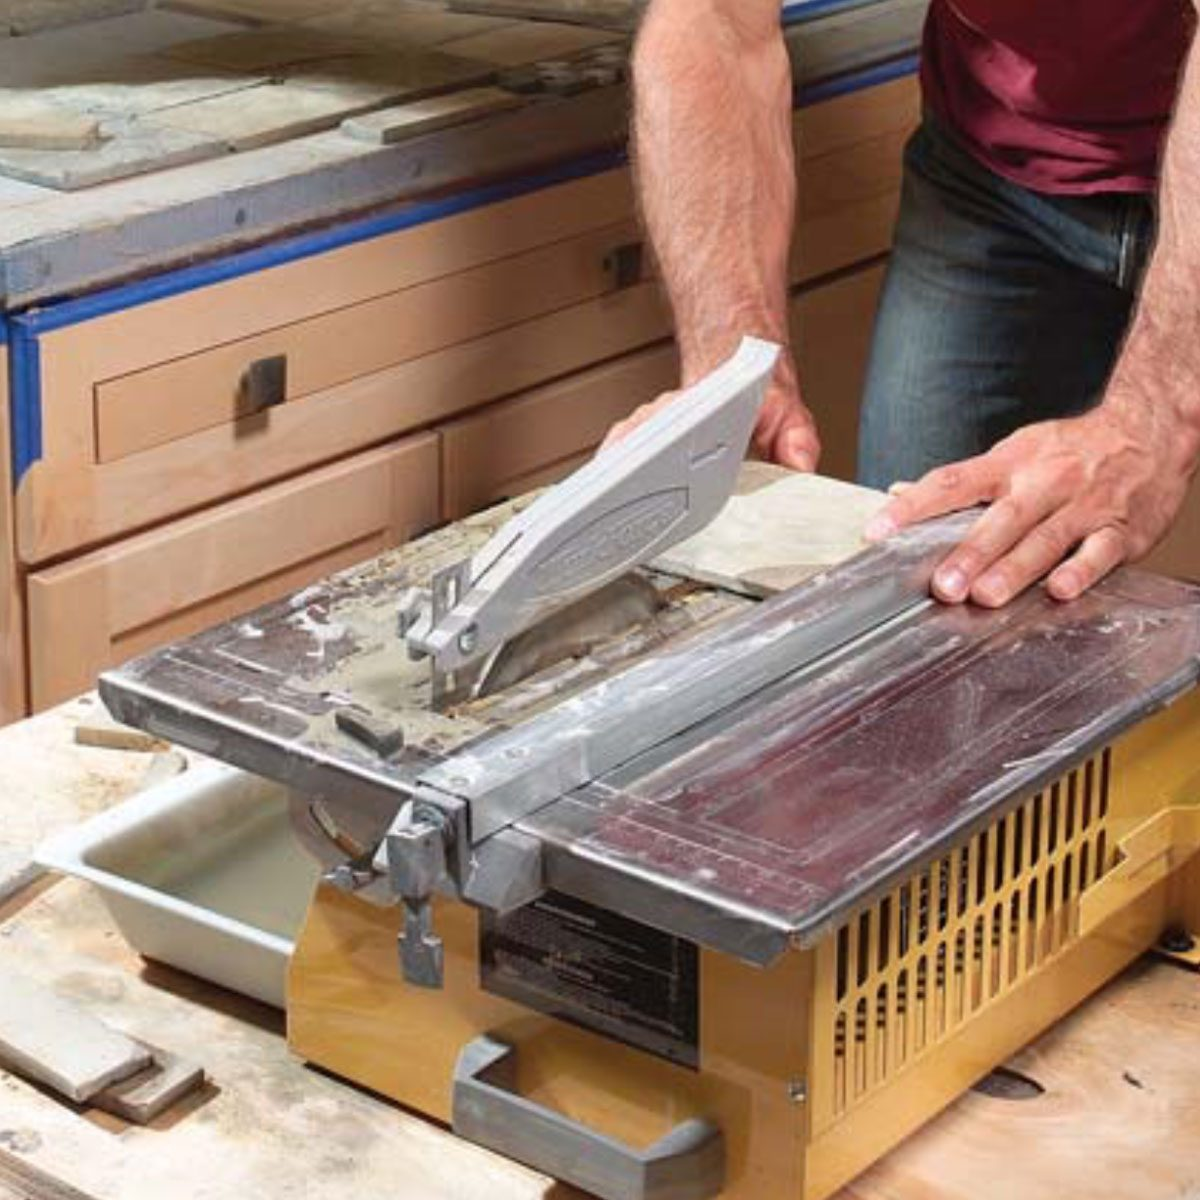 Kitchen Tile Countertops: Installing Tile Countertops: Ceramic Tile Kitchen